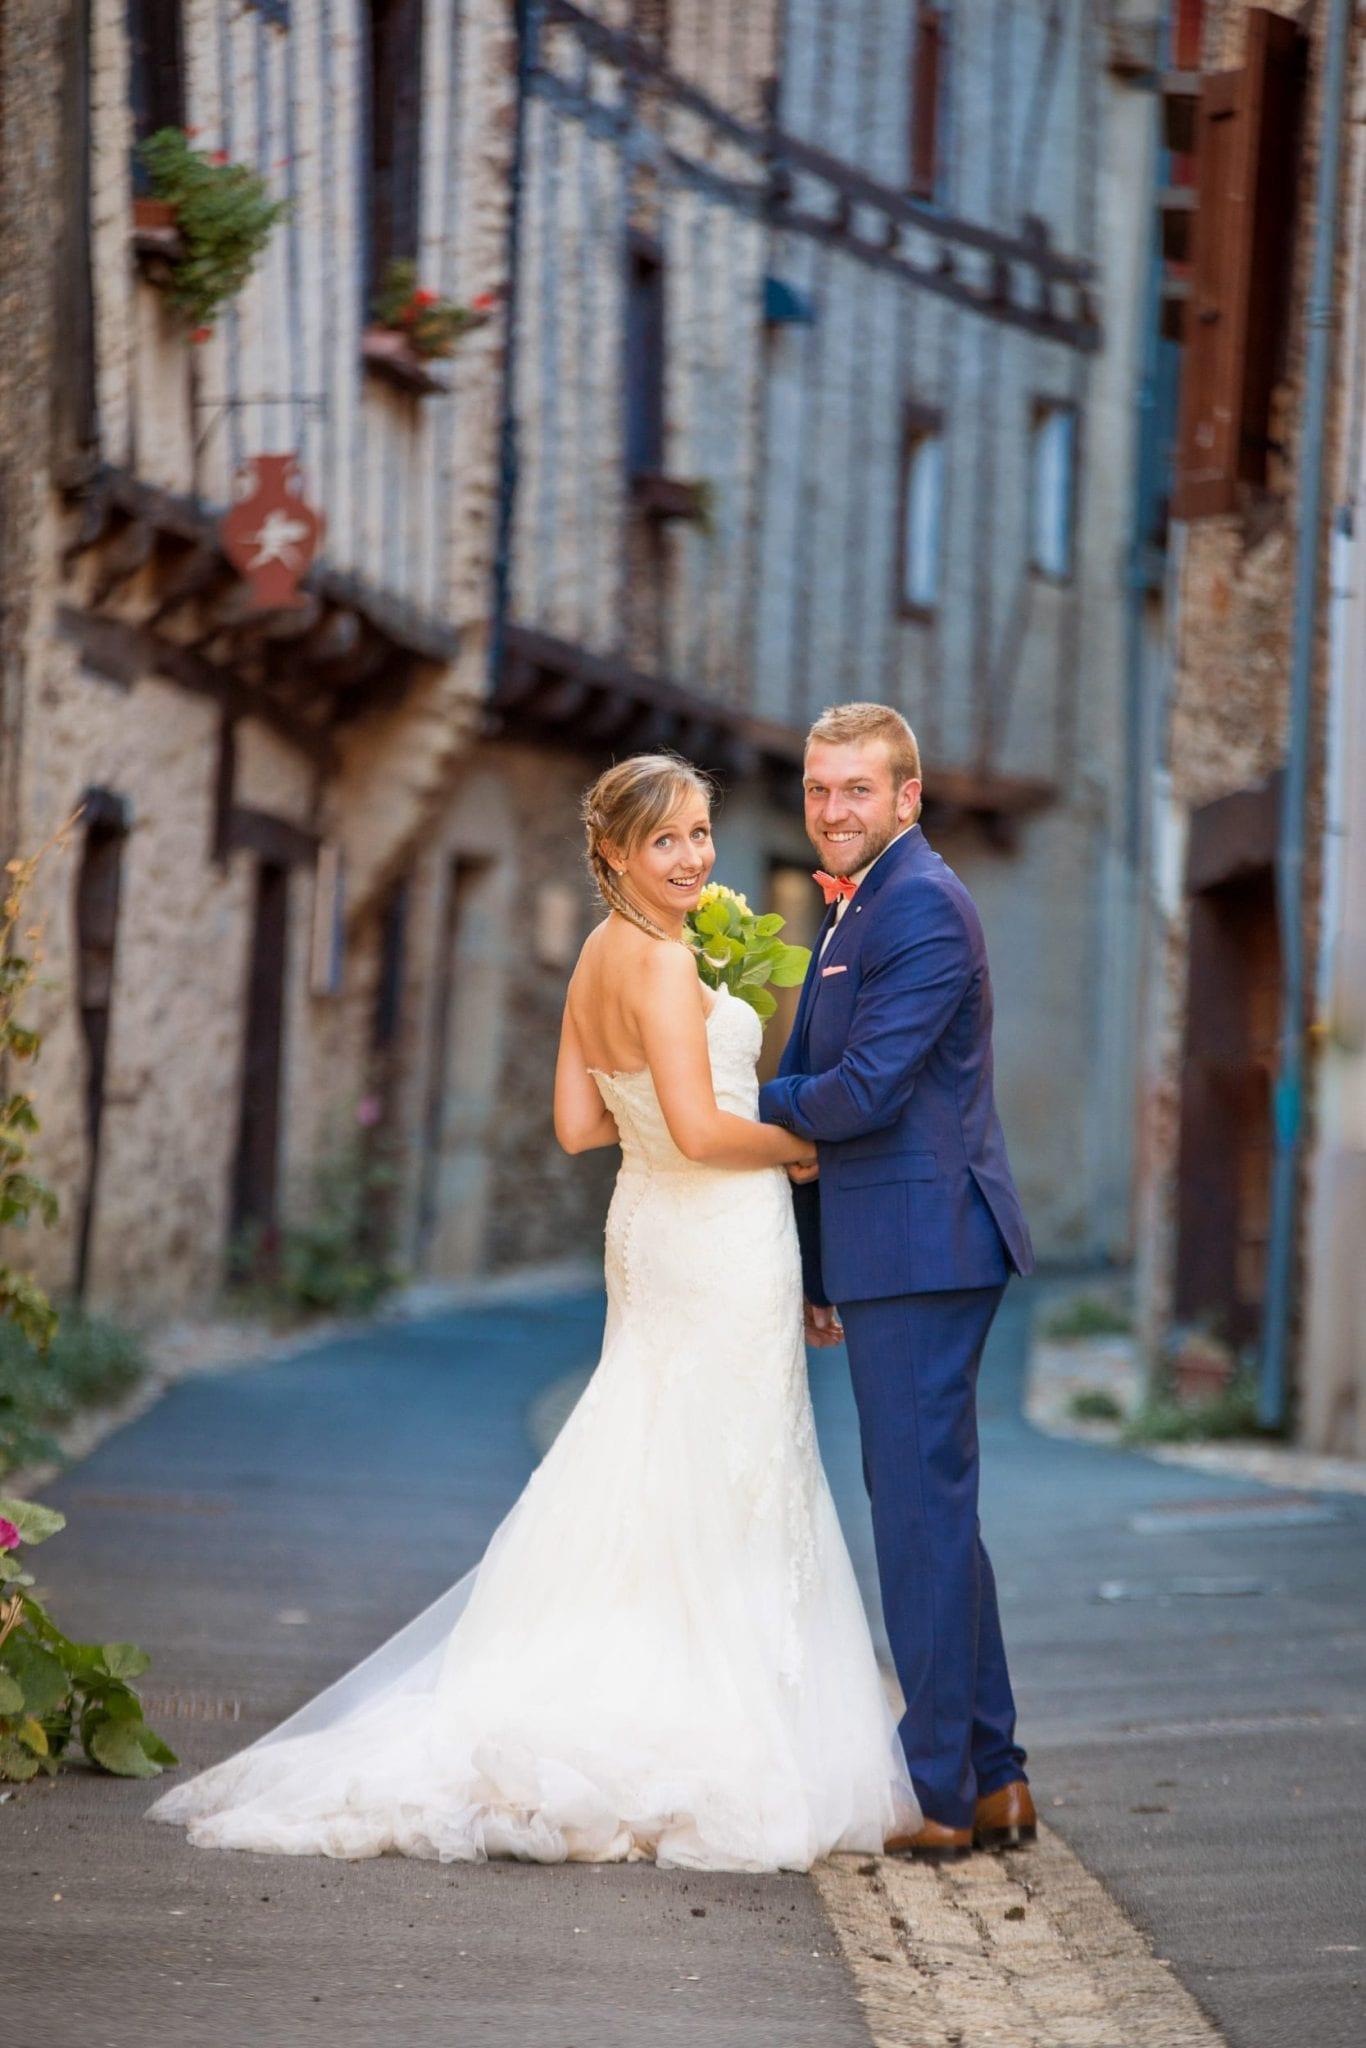 Mariage en Aveyron et Tarn